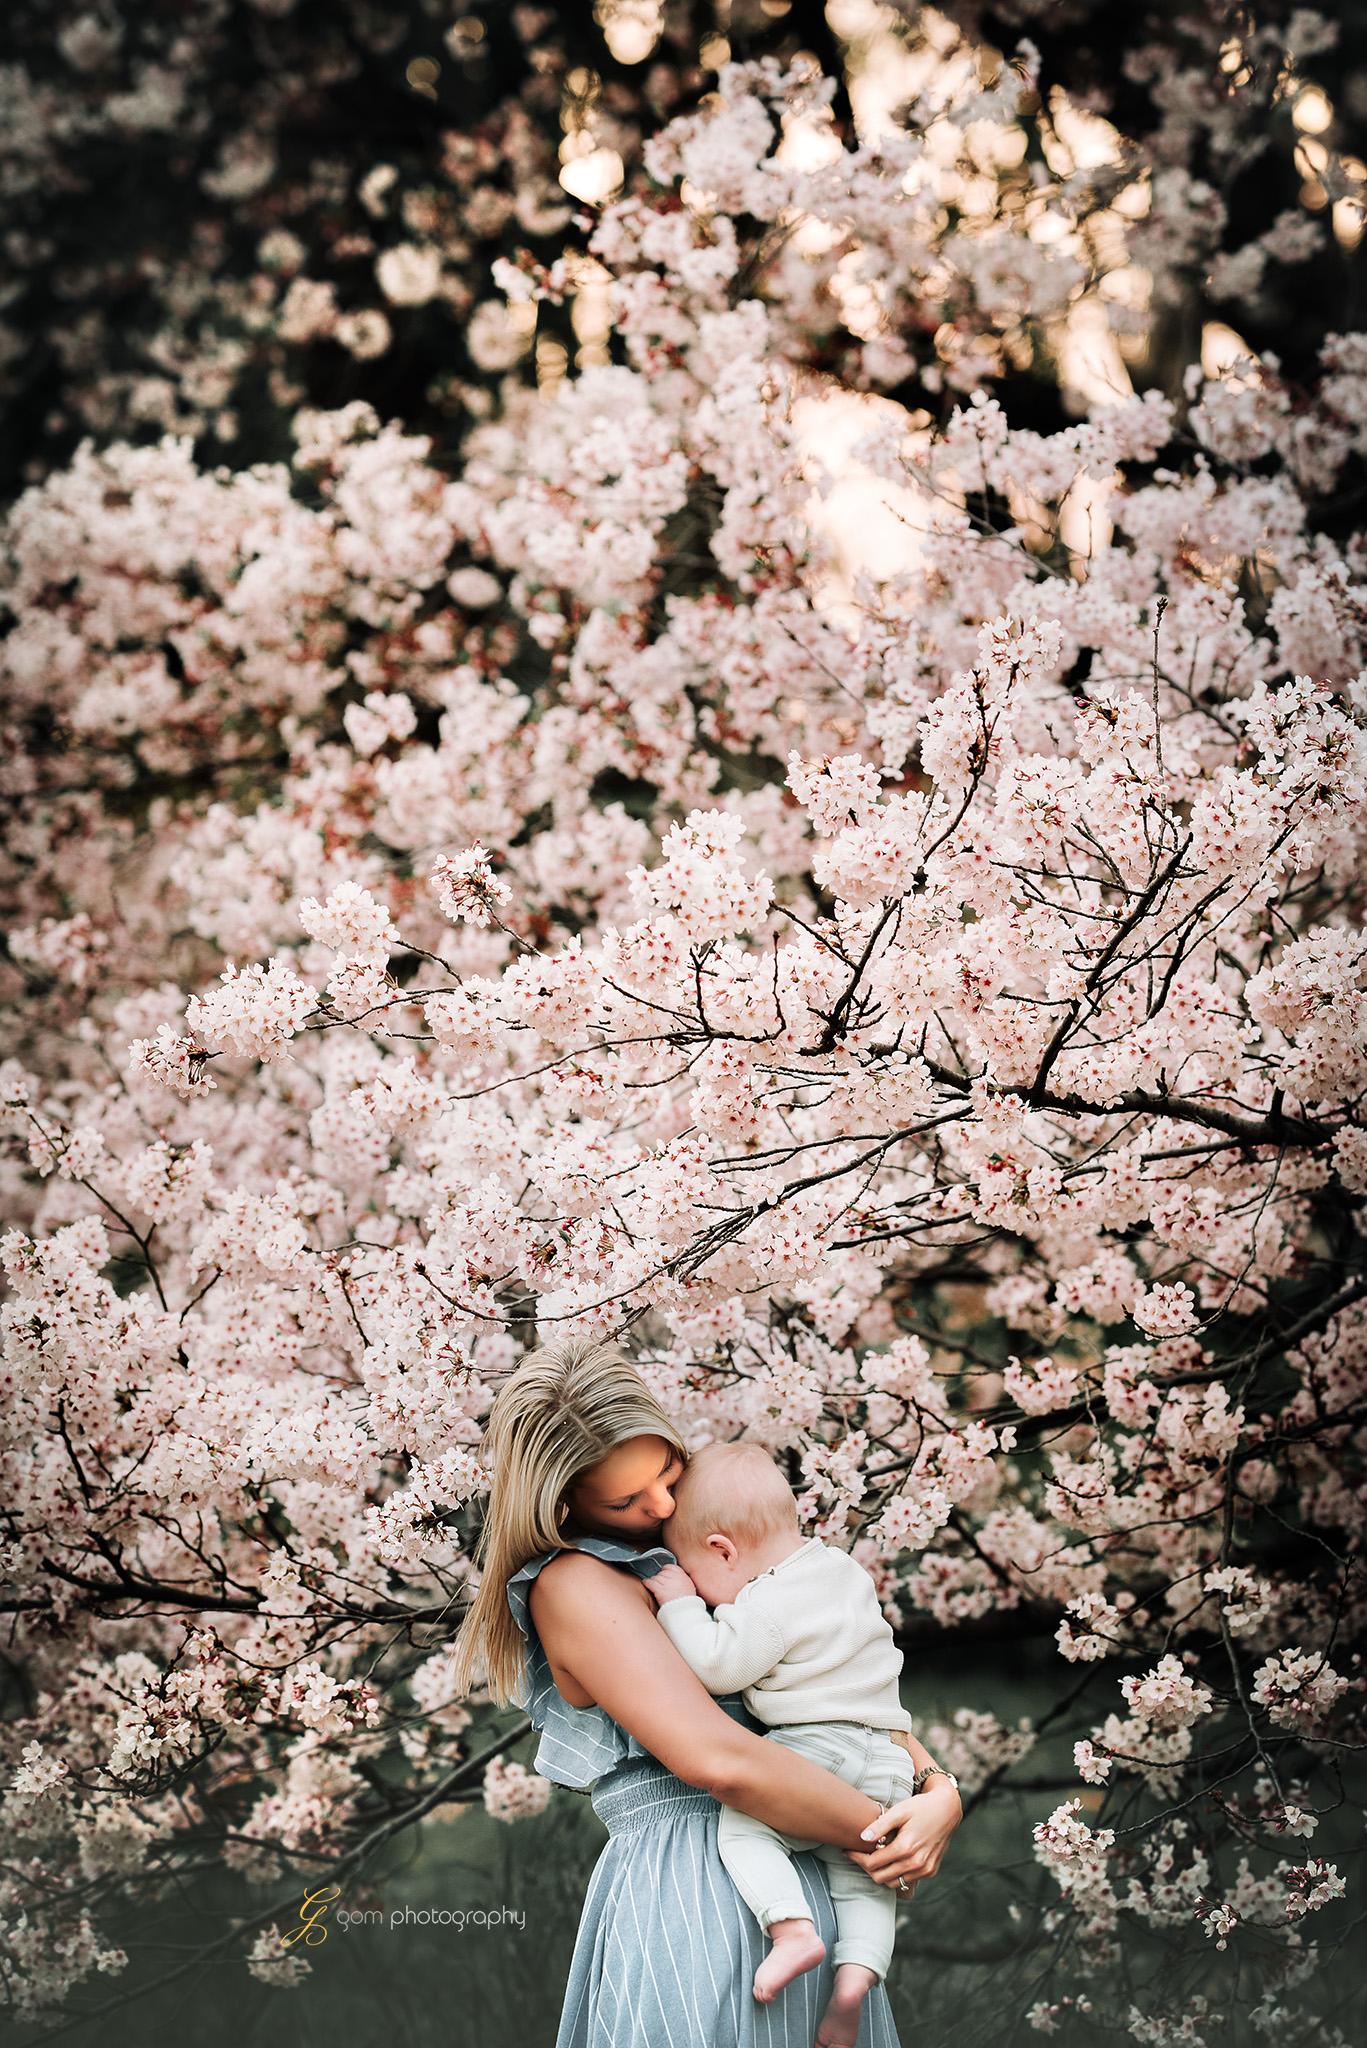 tokyo_photographer_cherry_blossom6